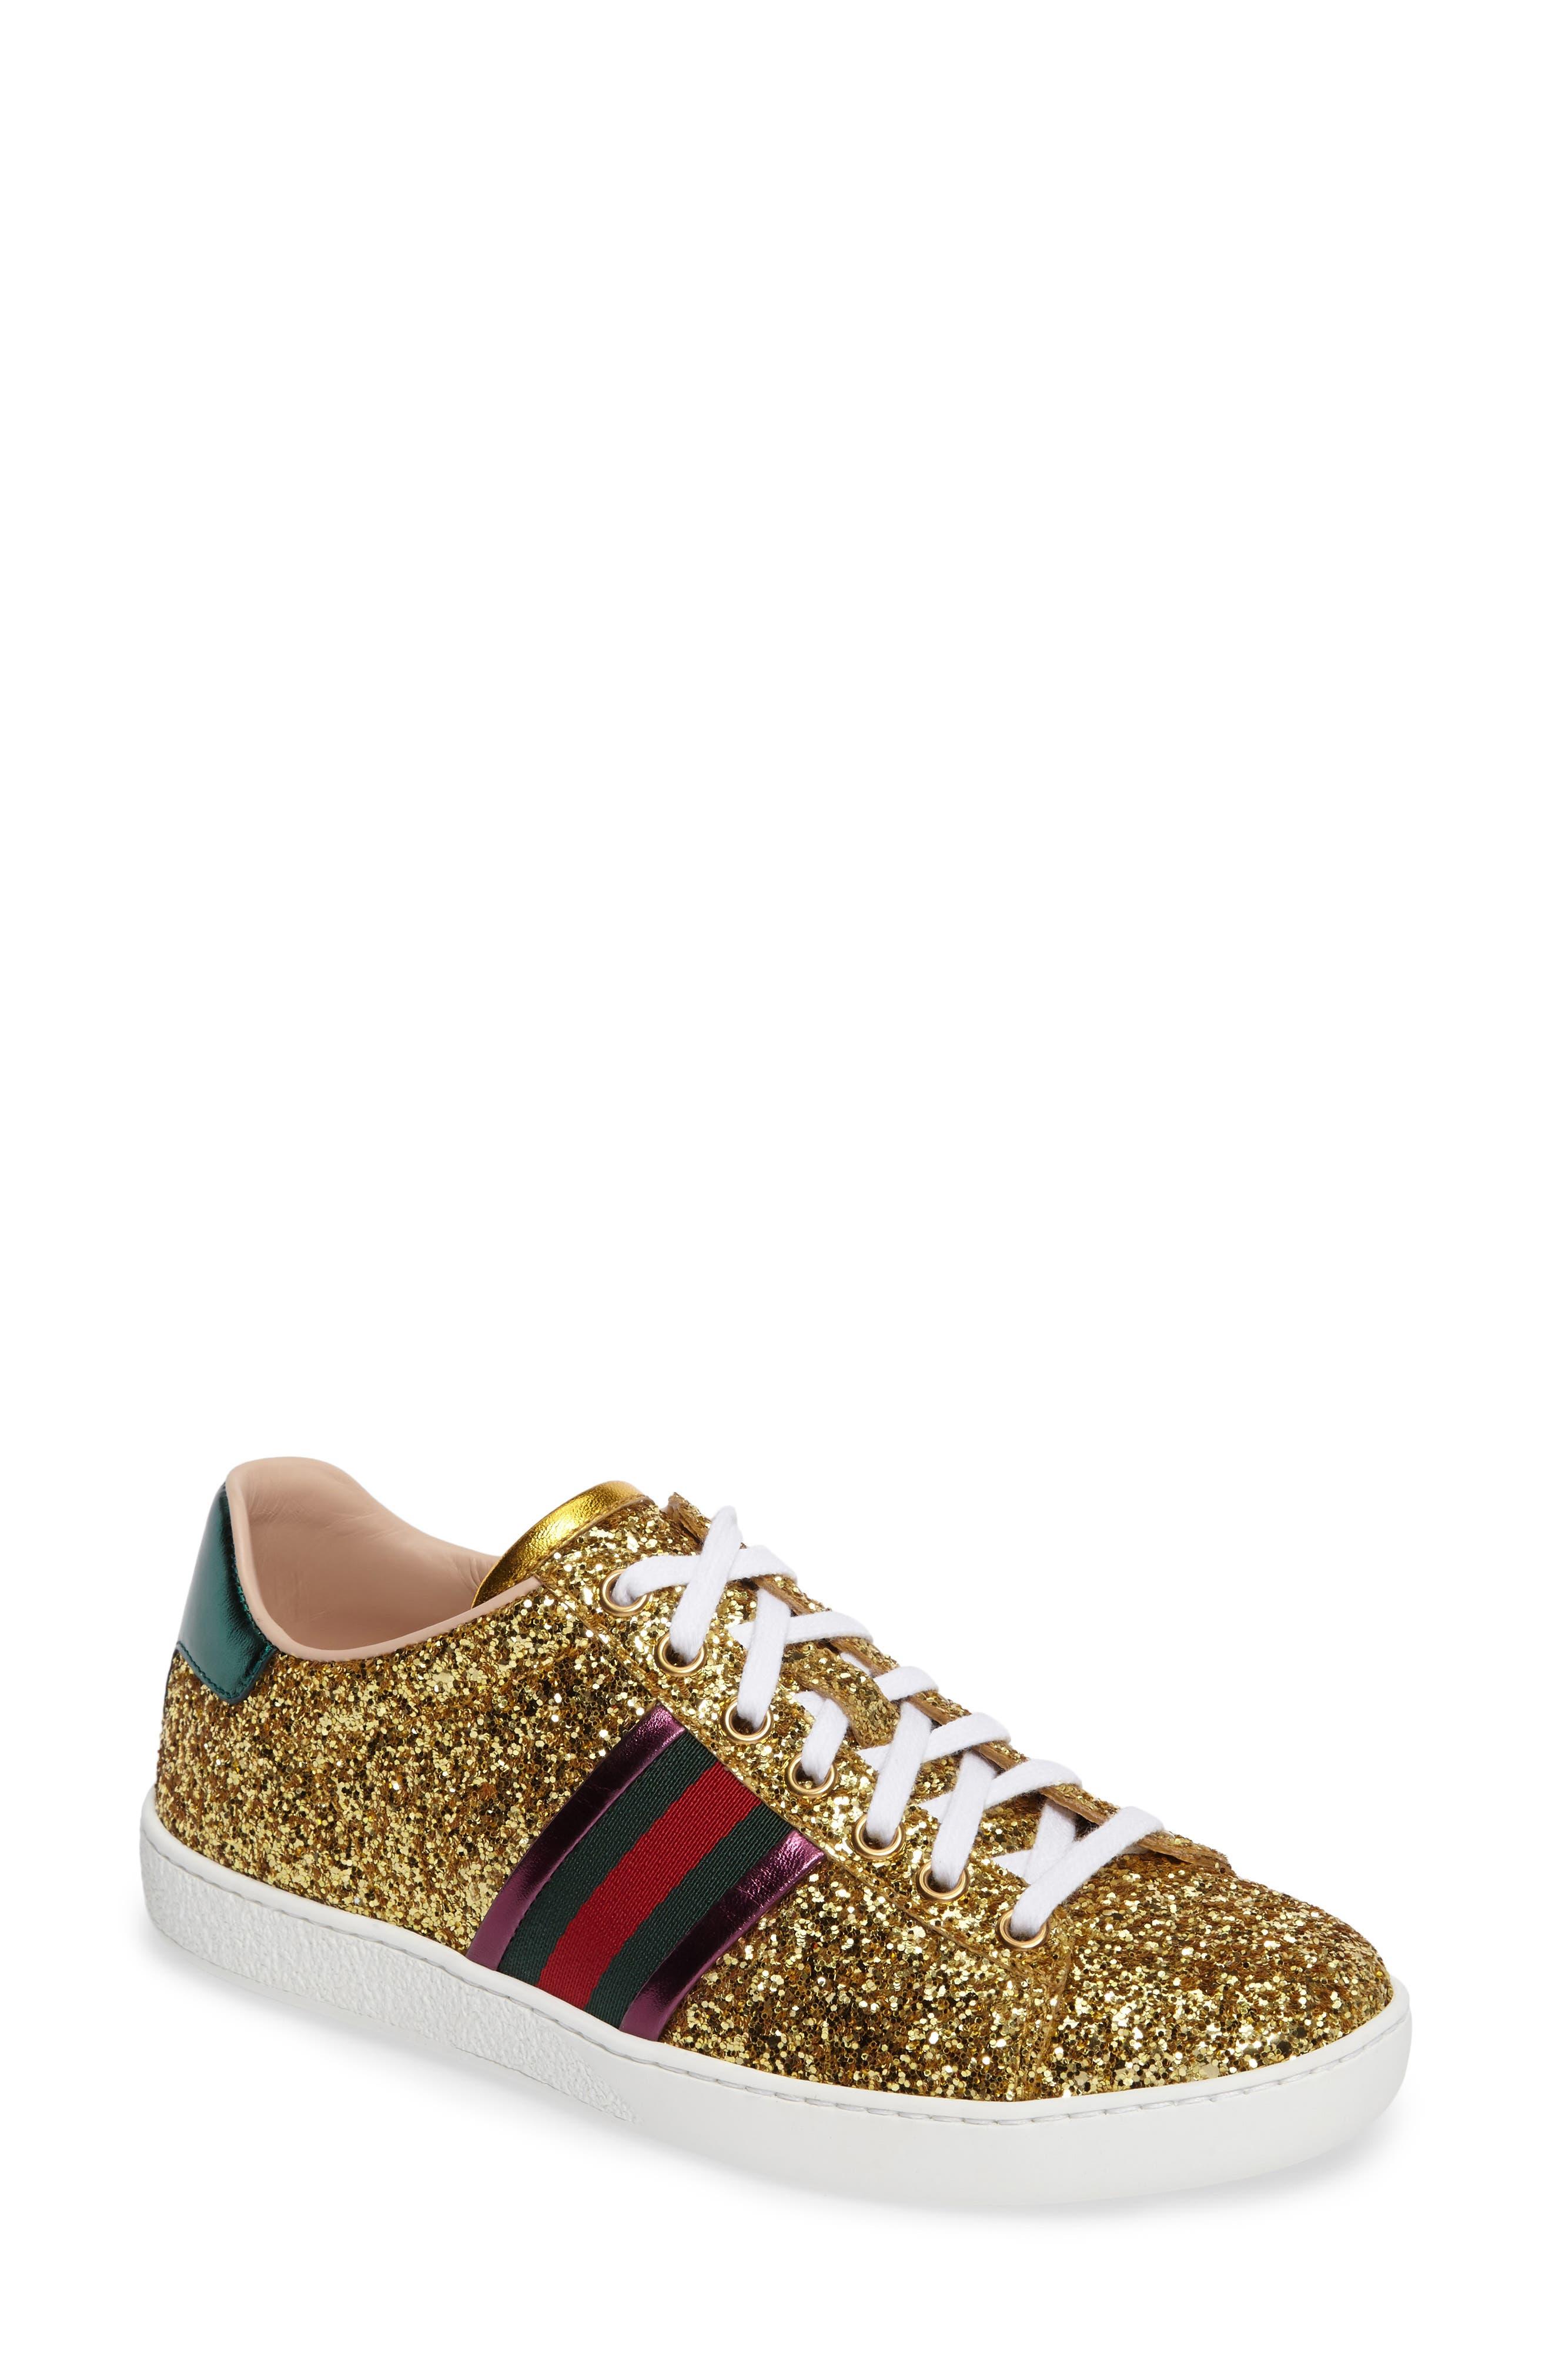 Main Image - Gucci New Ace Glitter Sneaker (Women)